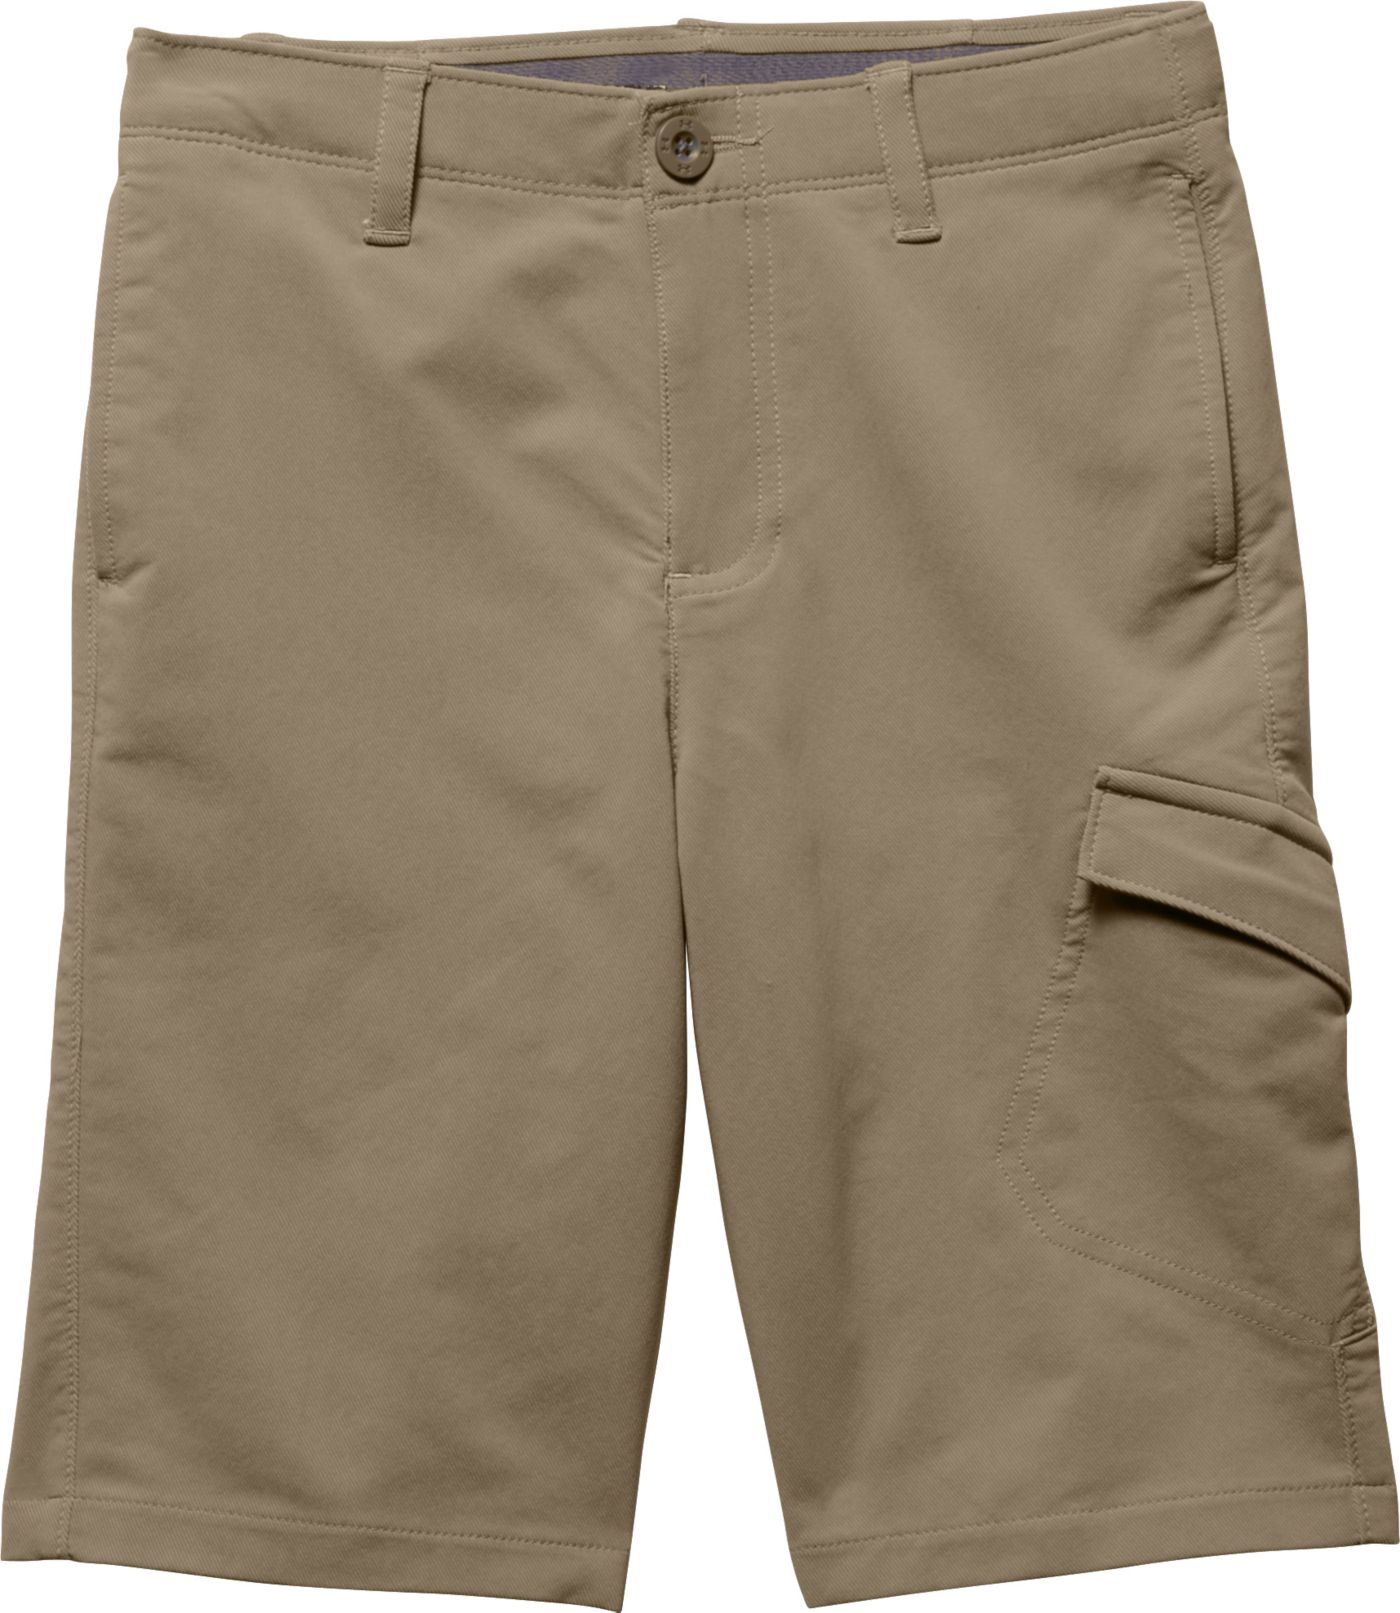 Under Armour Boys' Match Play Cargo Shorts